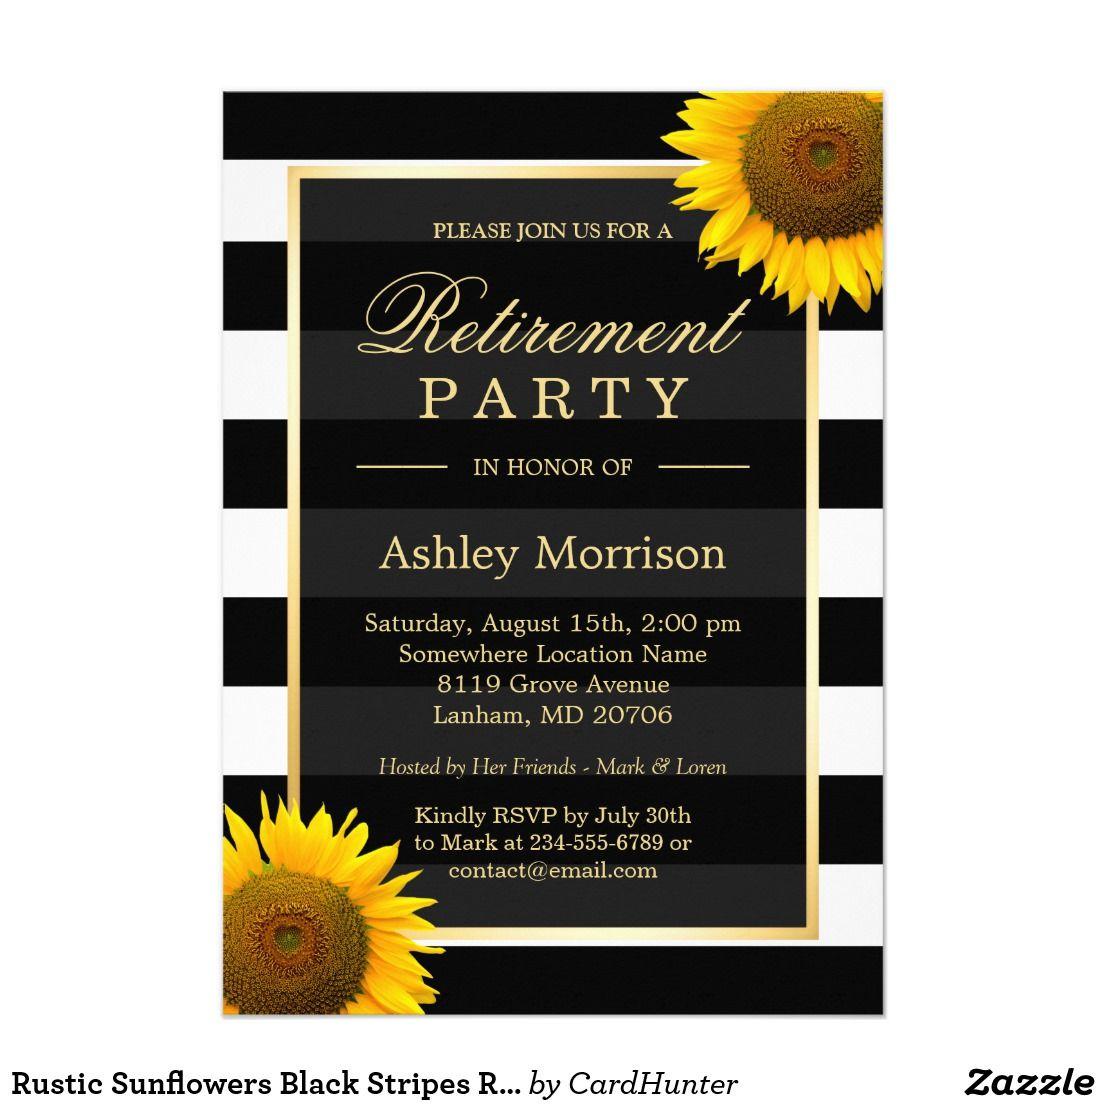 Rustic Sunflowers Black Stripes Retirement Party